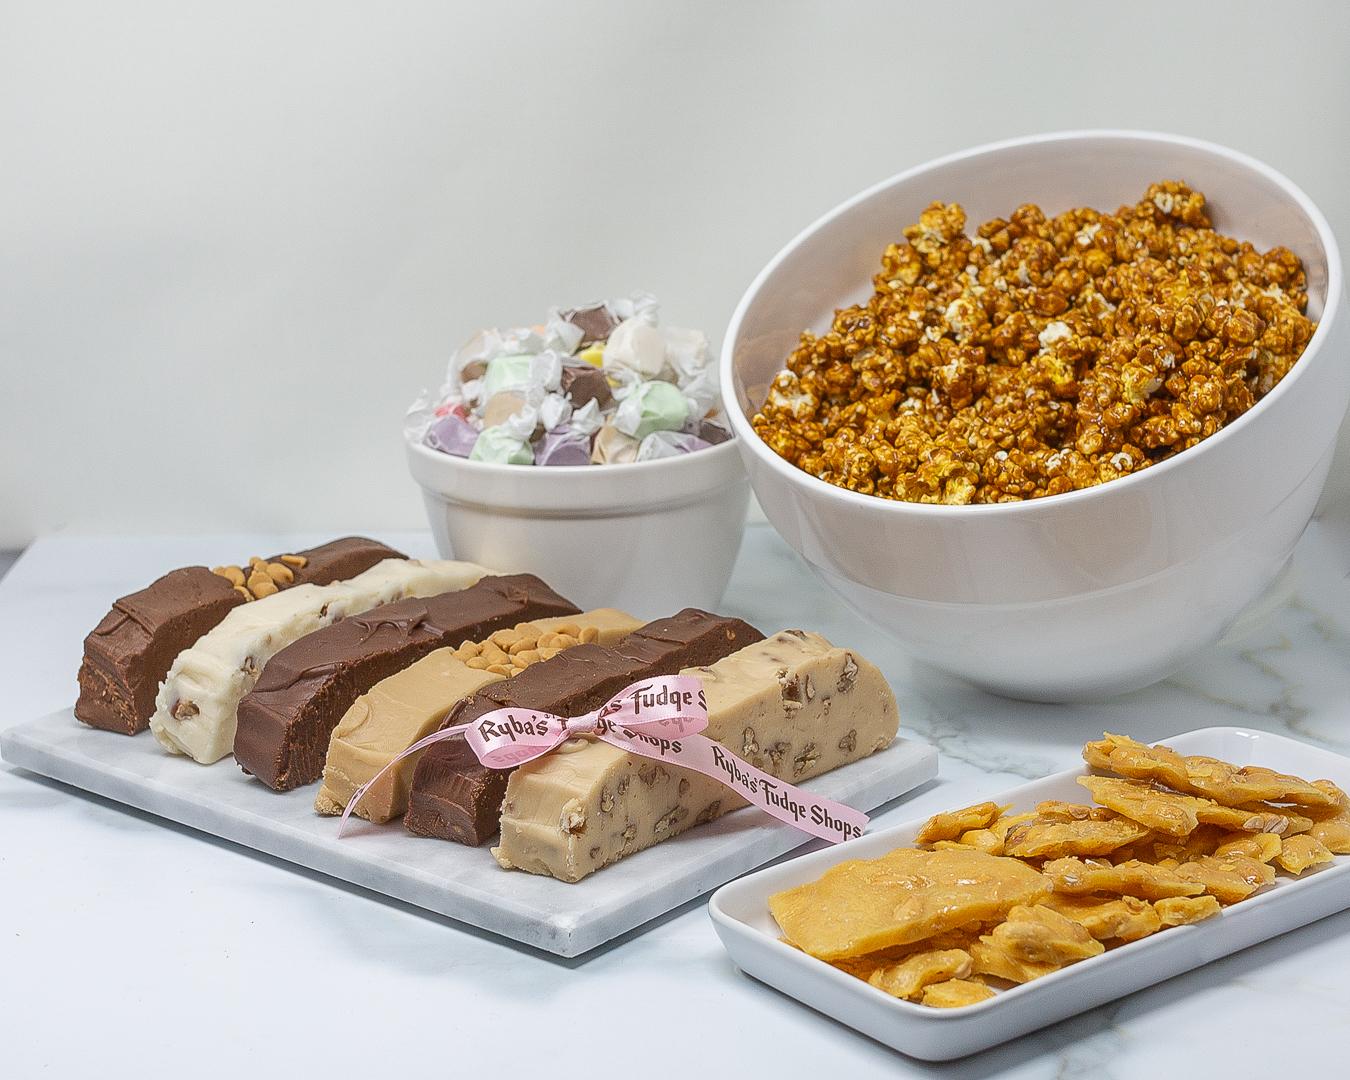 Ryba's Fudge Shops Mackinac Island Fudge, caramel corn, taffy, brittle